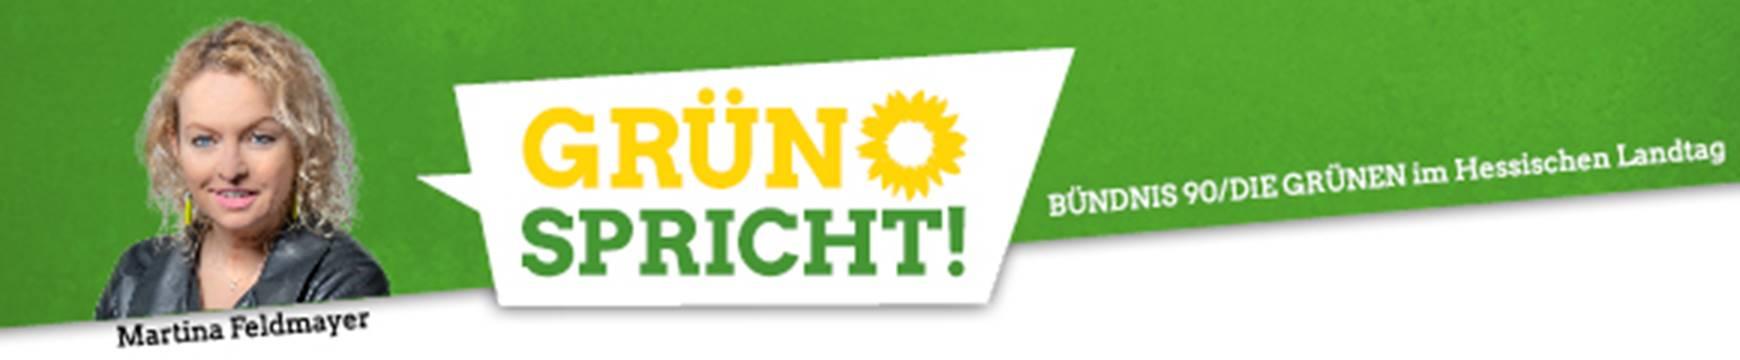 Grün Spricht Kurz Pressemitteilung Martina Feldmayer